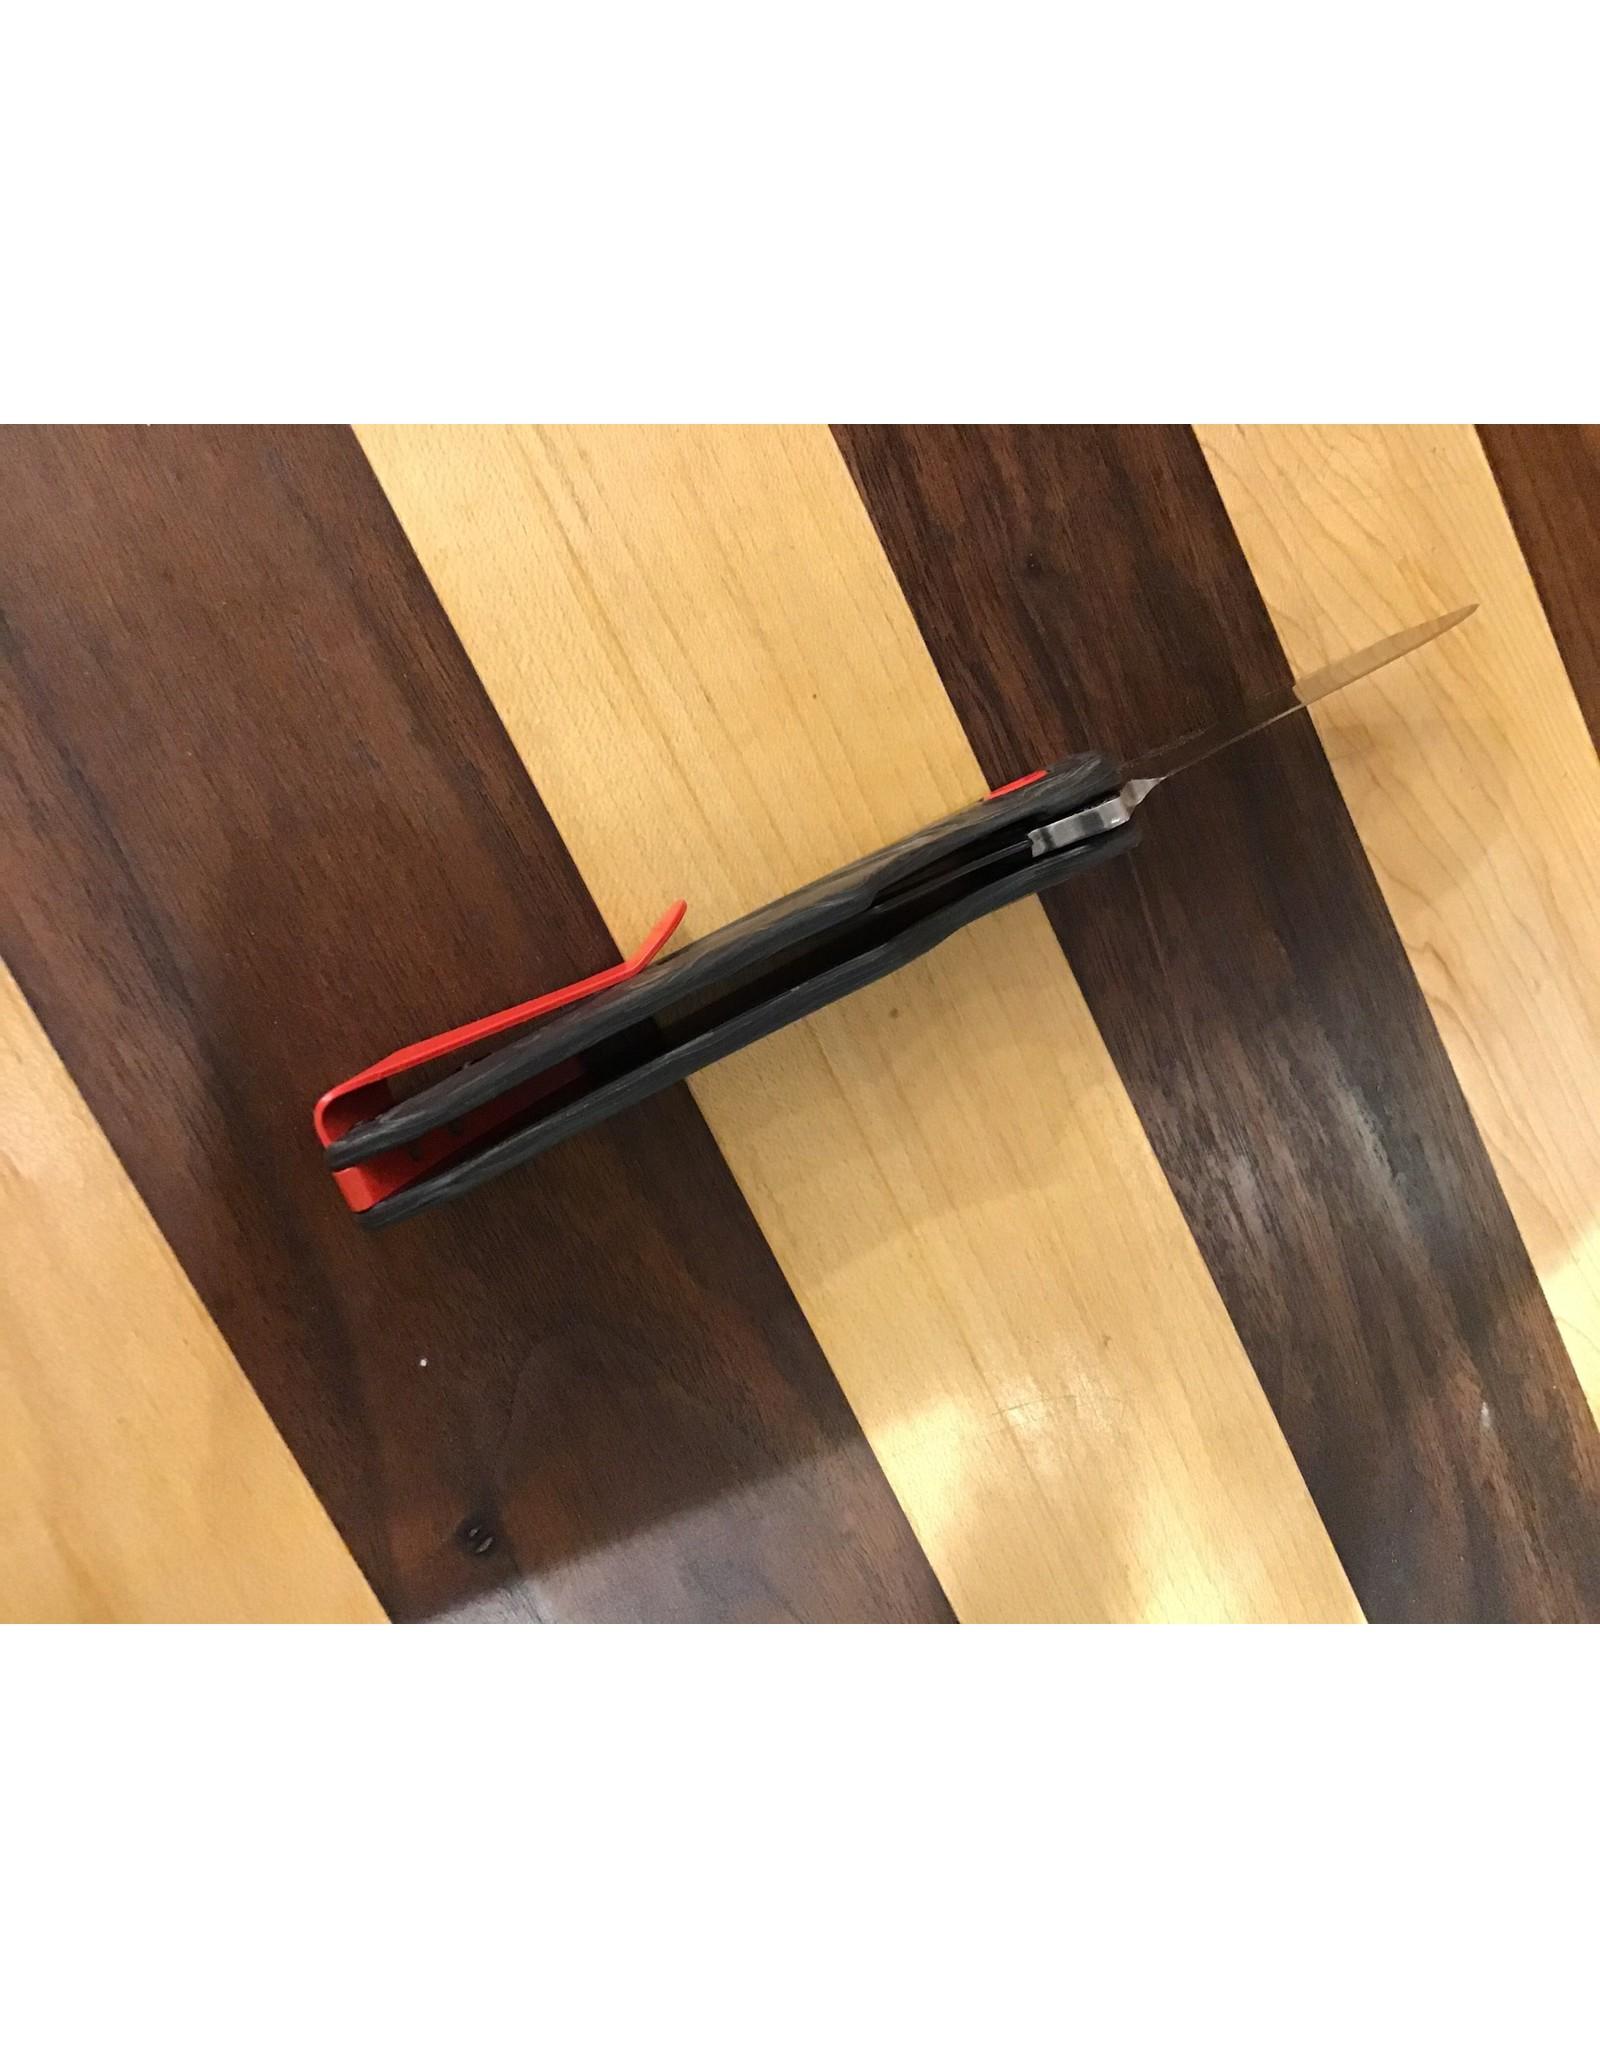 Buck Buck Sprint Pro Liner Lock Marble Carbon Fiber